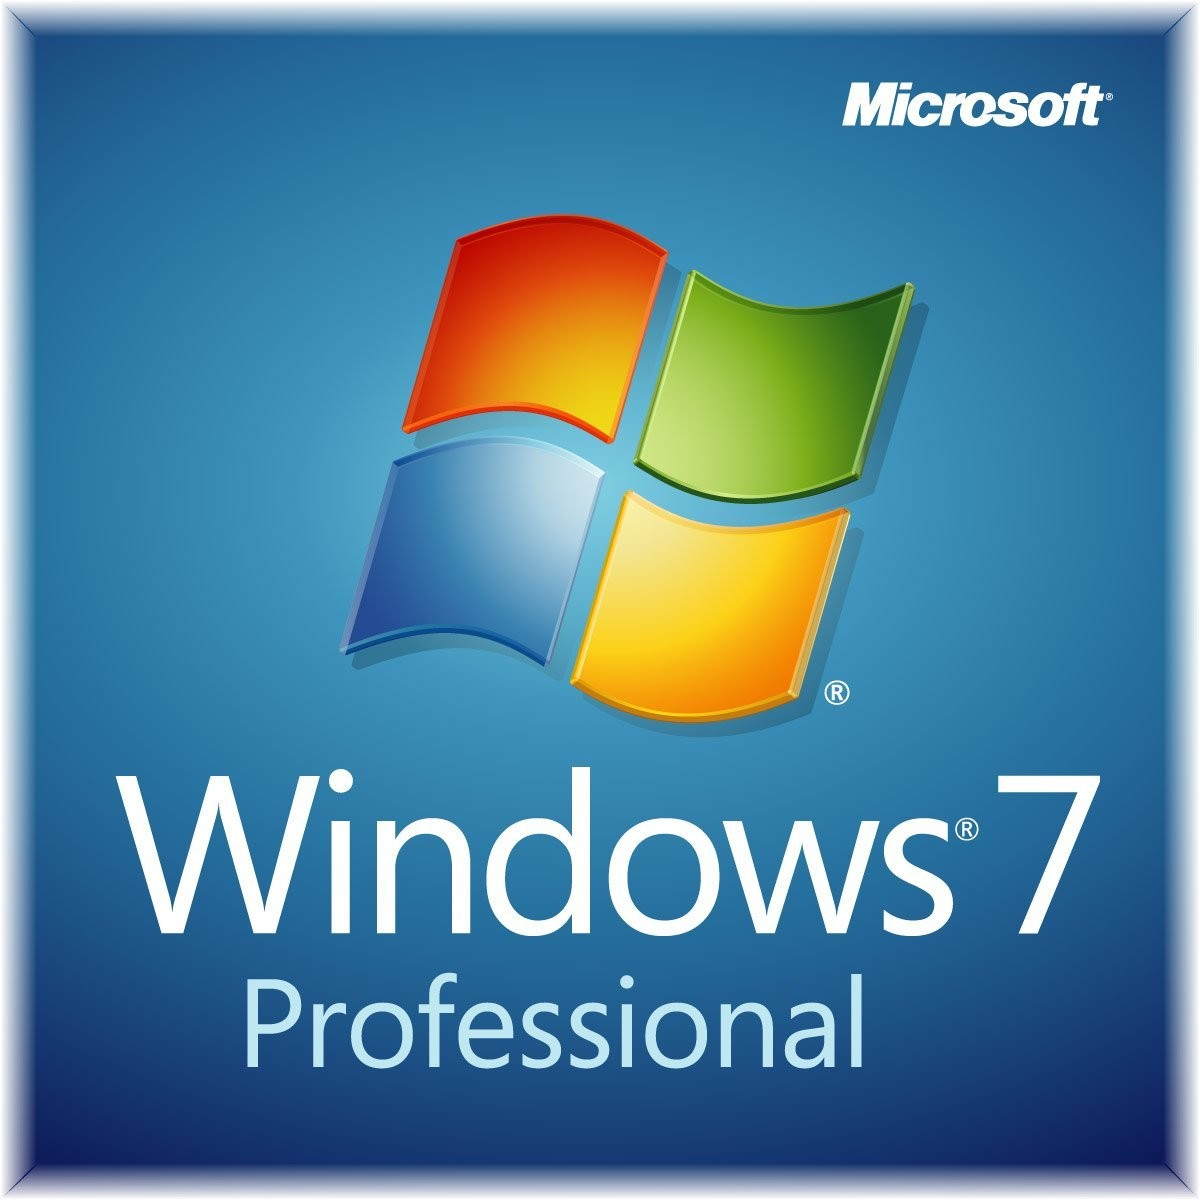 Microsoft Windows 7 Professional - 1 PC Download